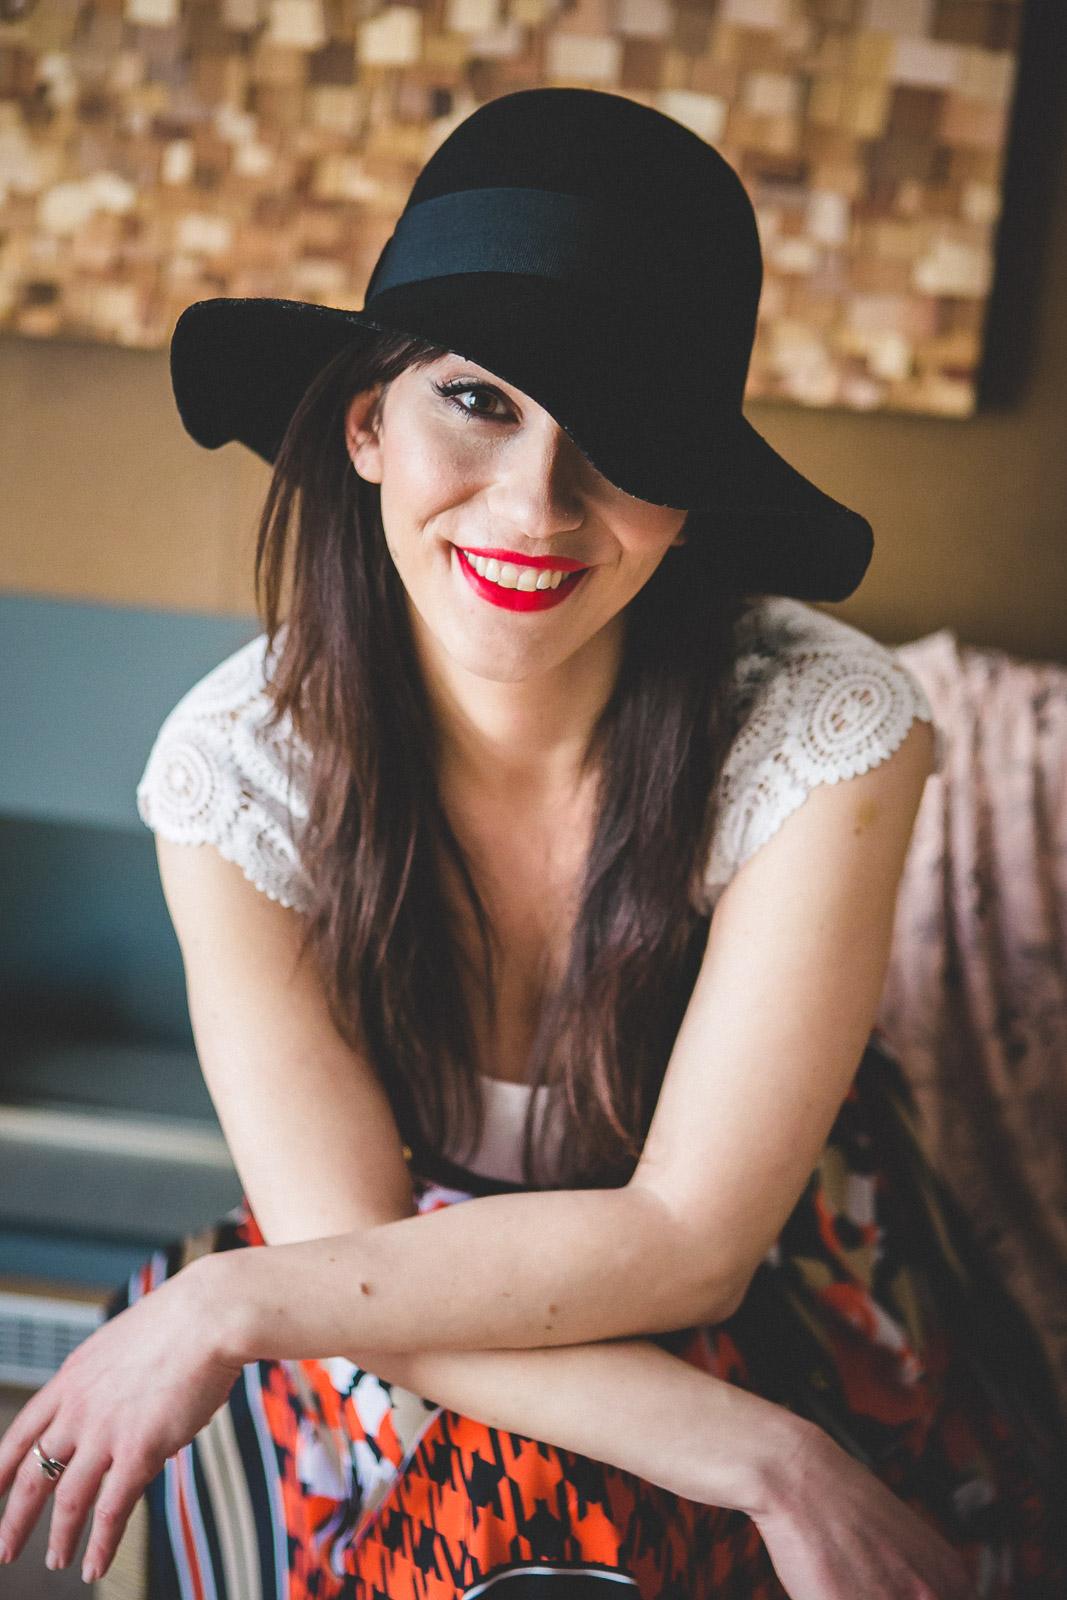 Dragana_Portraits-9.jpg